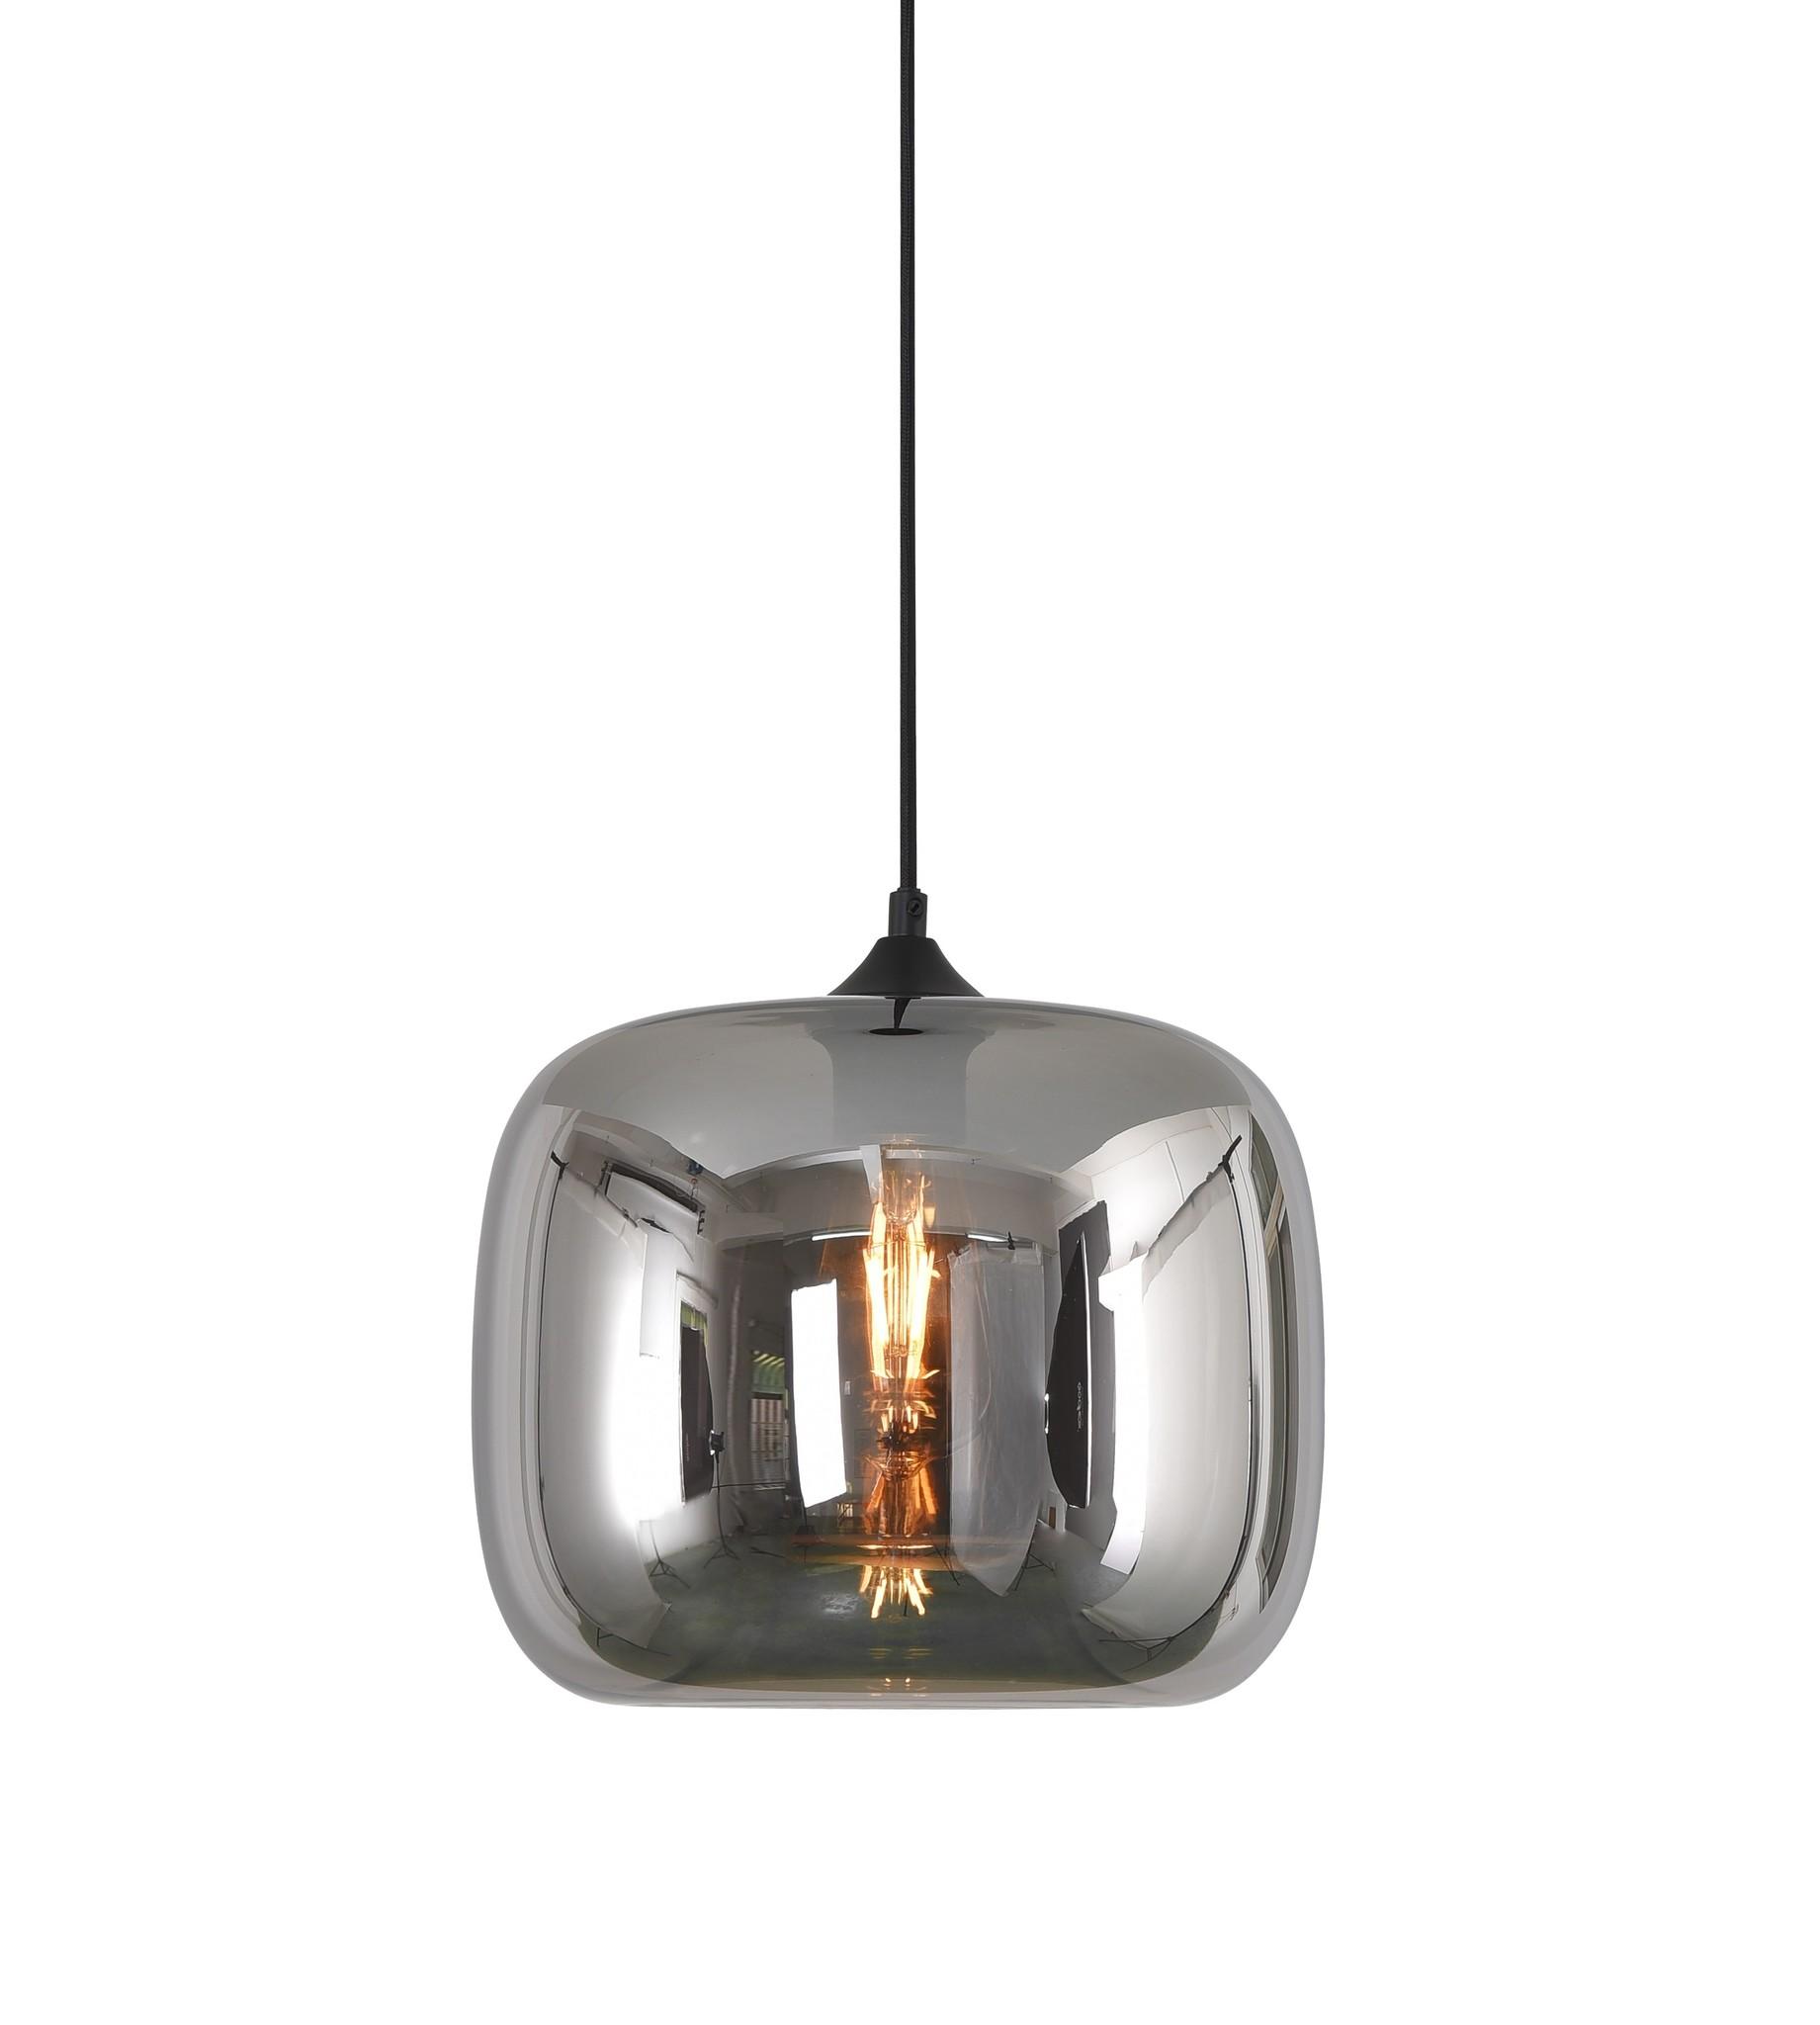 Hanglamp Preston Zwart & Smoke Glas 28cm